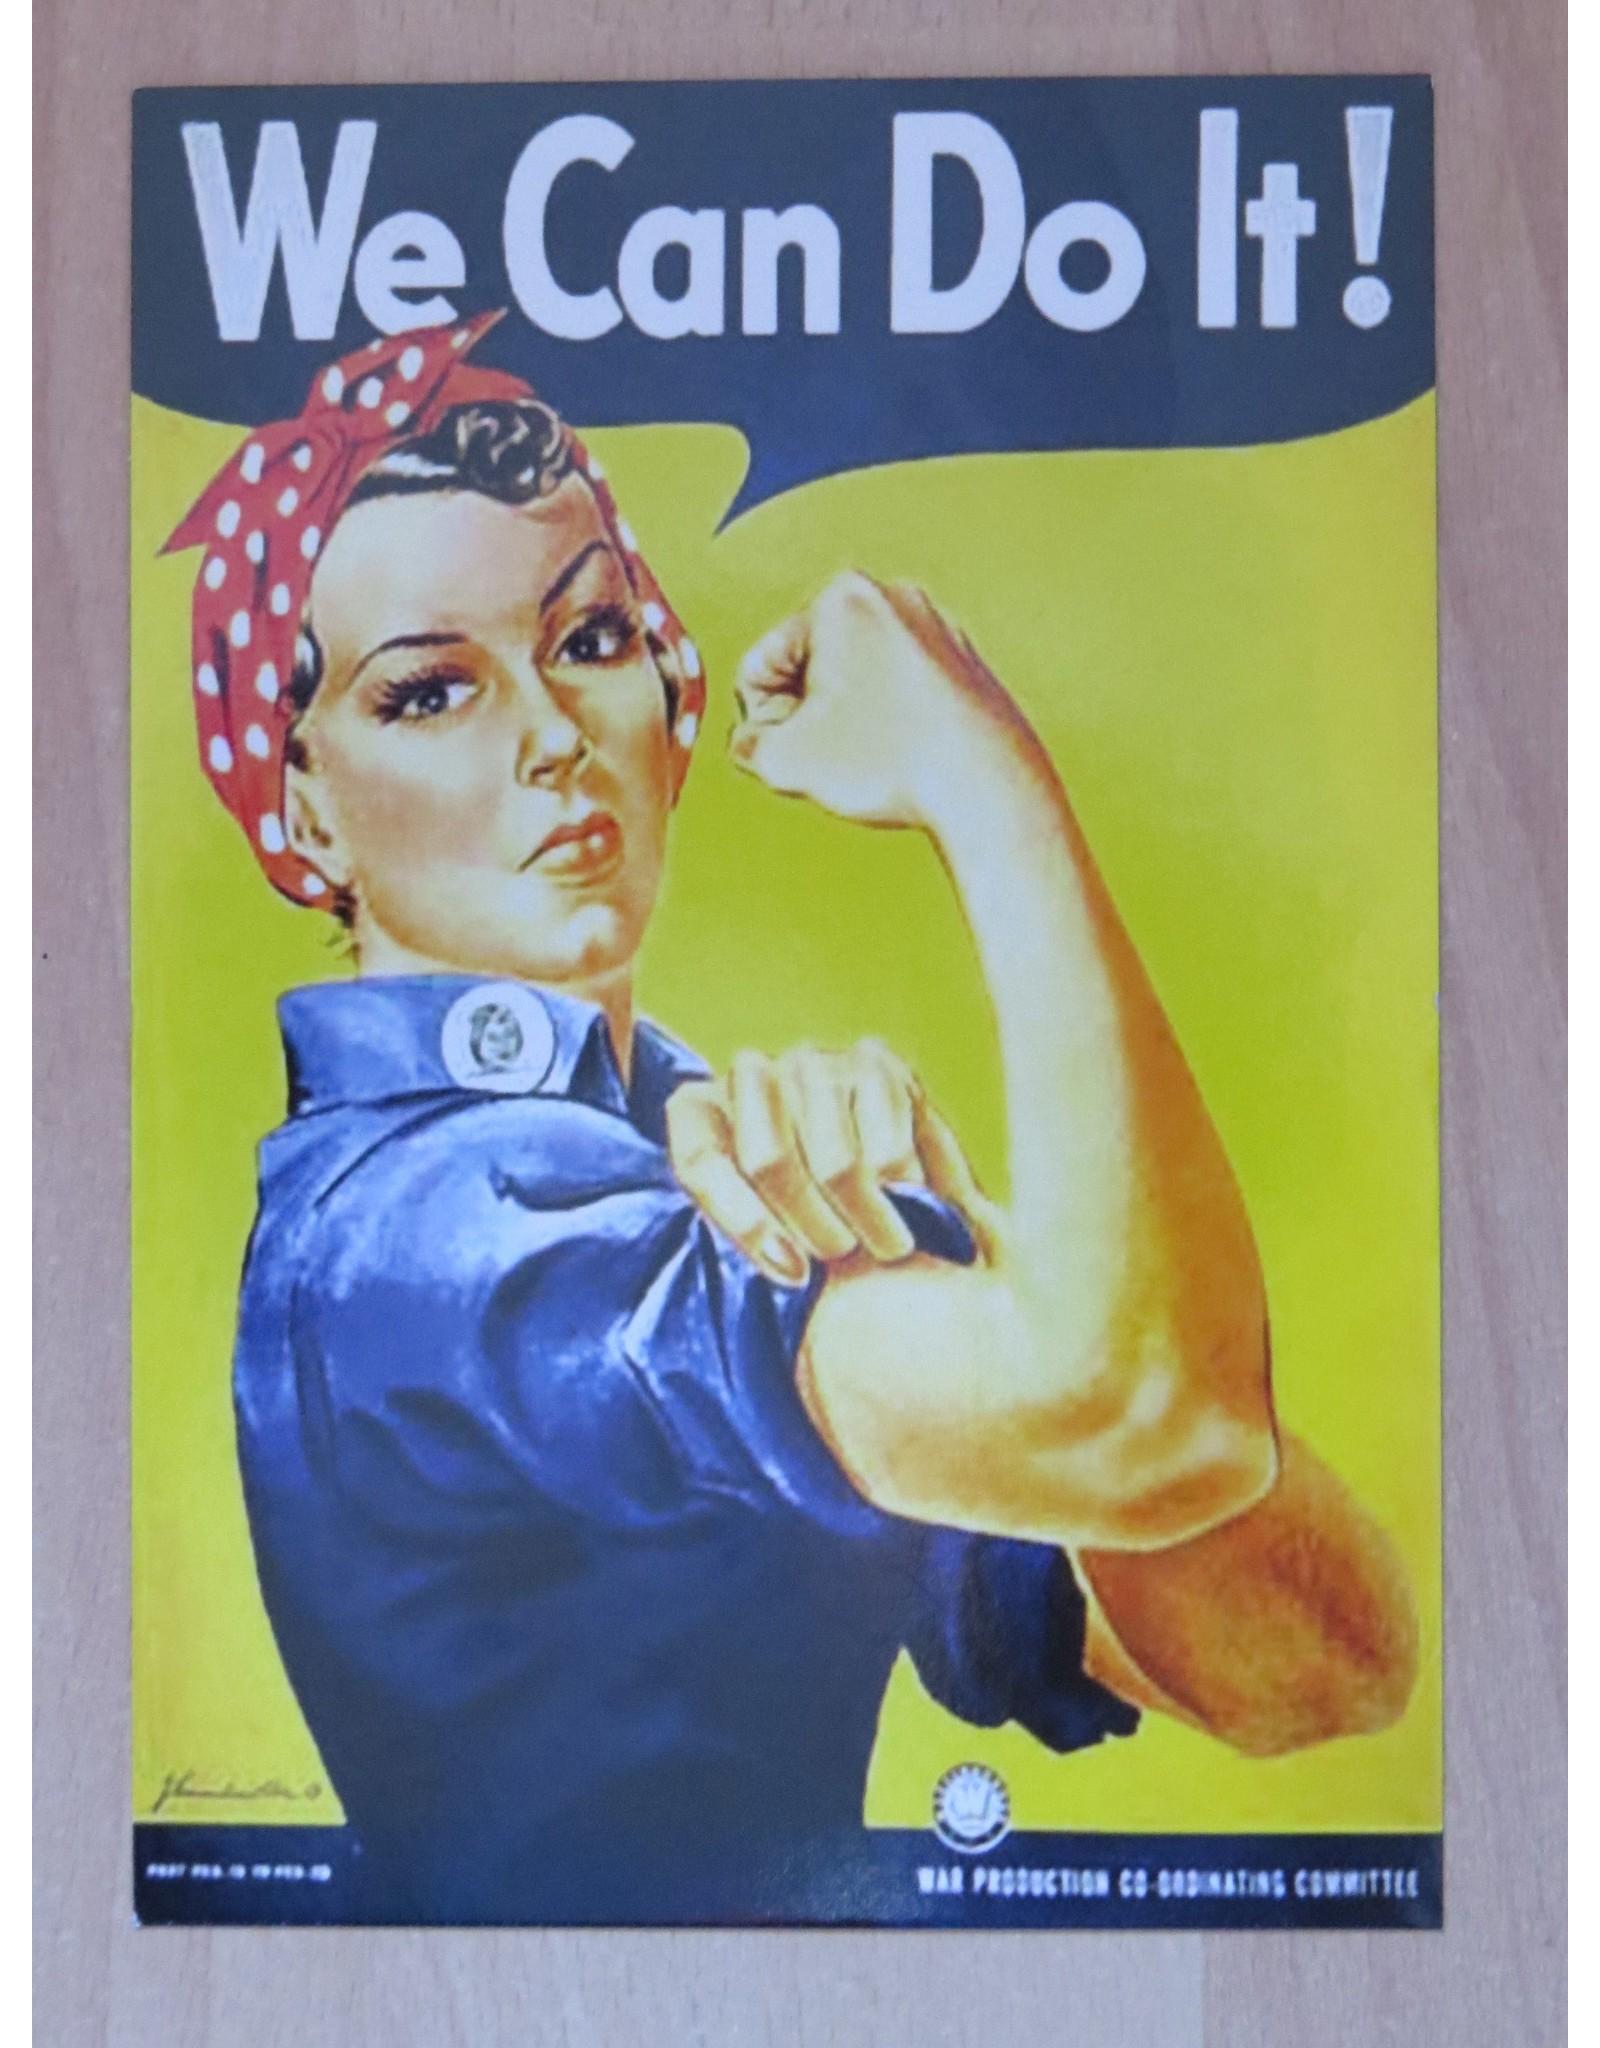 Kaartje - We can do it!